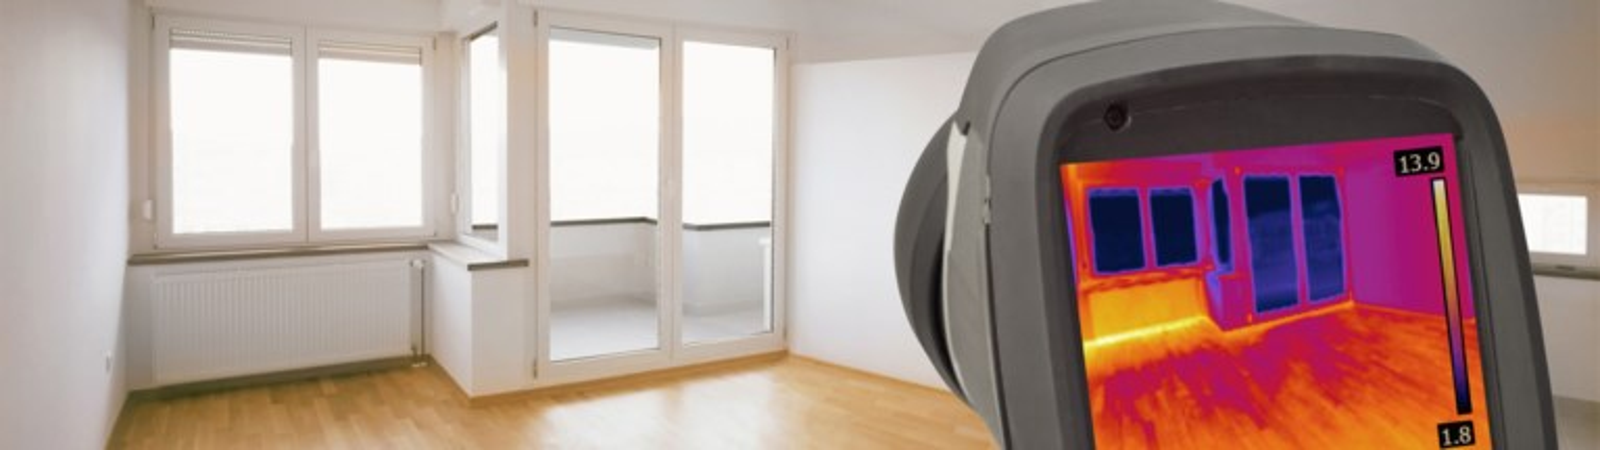 Neue Wärmedämmfenster sparen kräftig Heizkosten